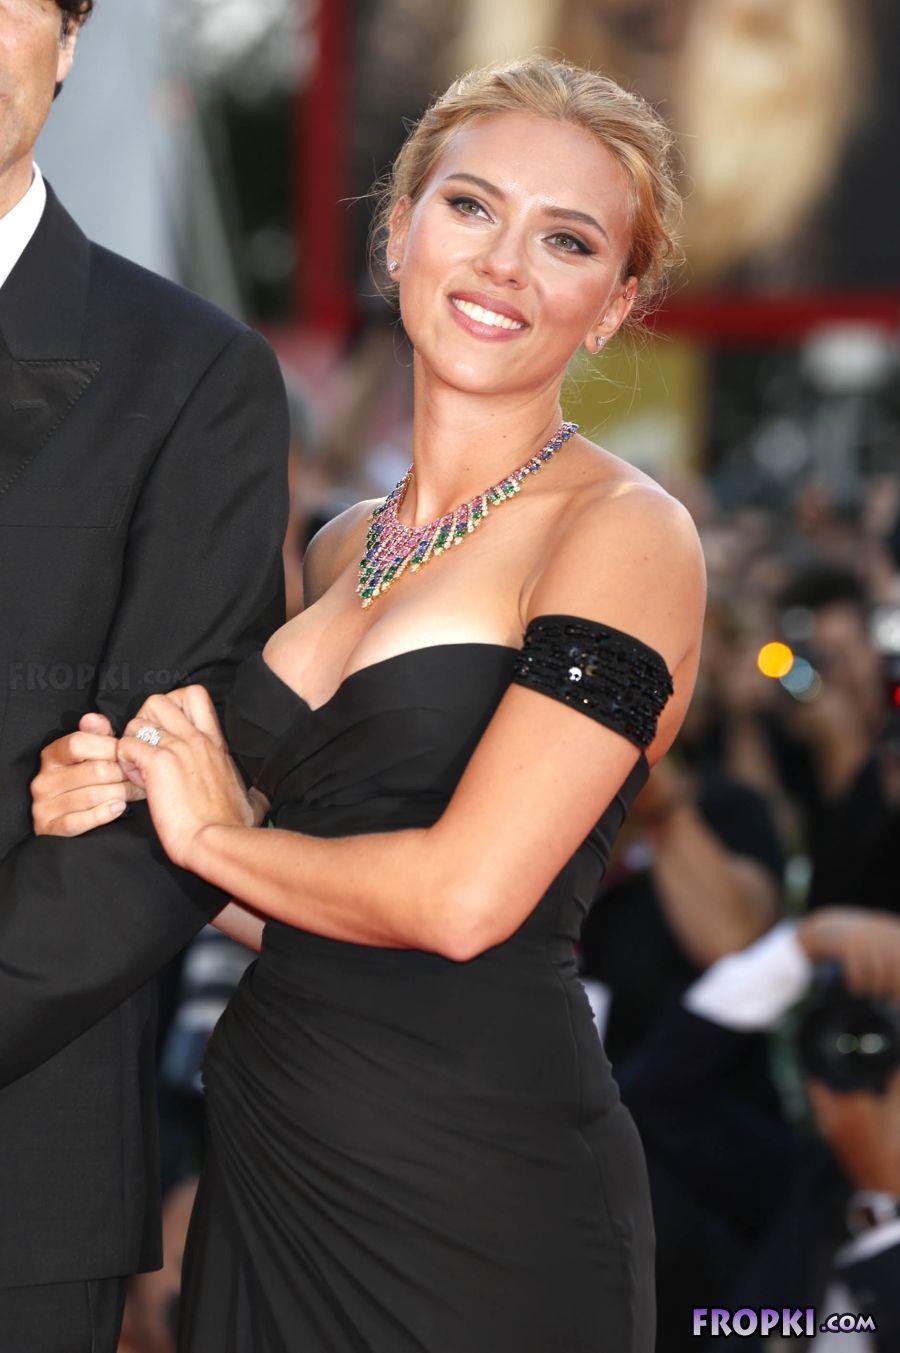 Scarlett Johansson Fropki 31